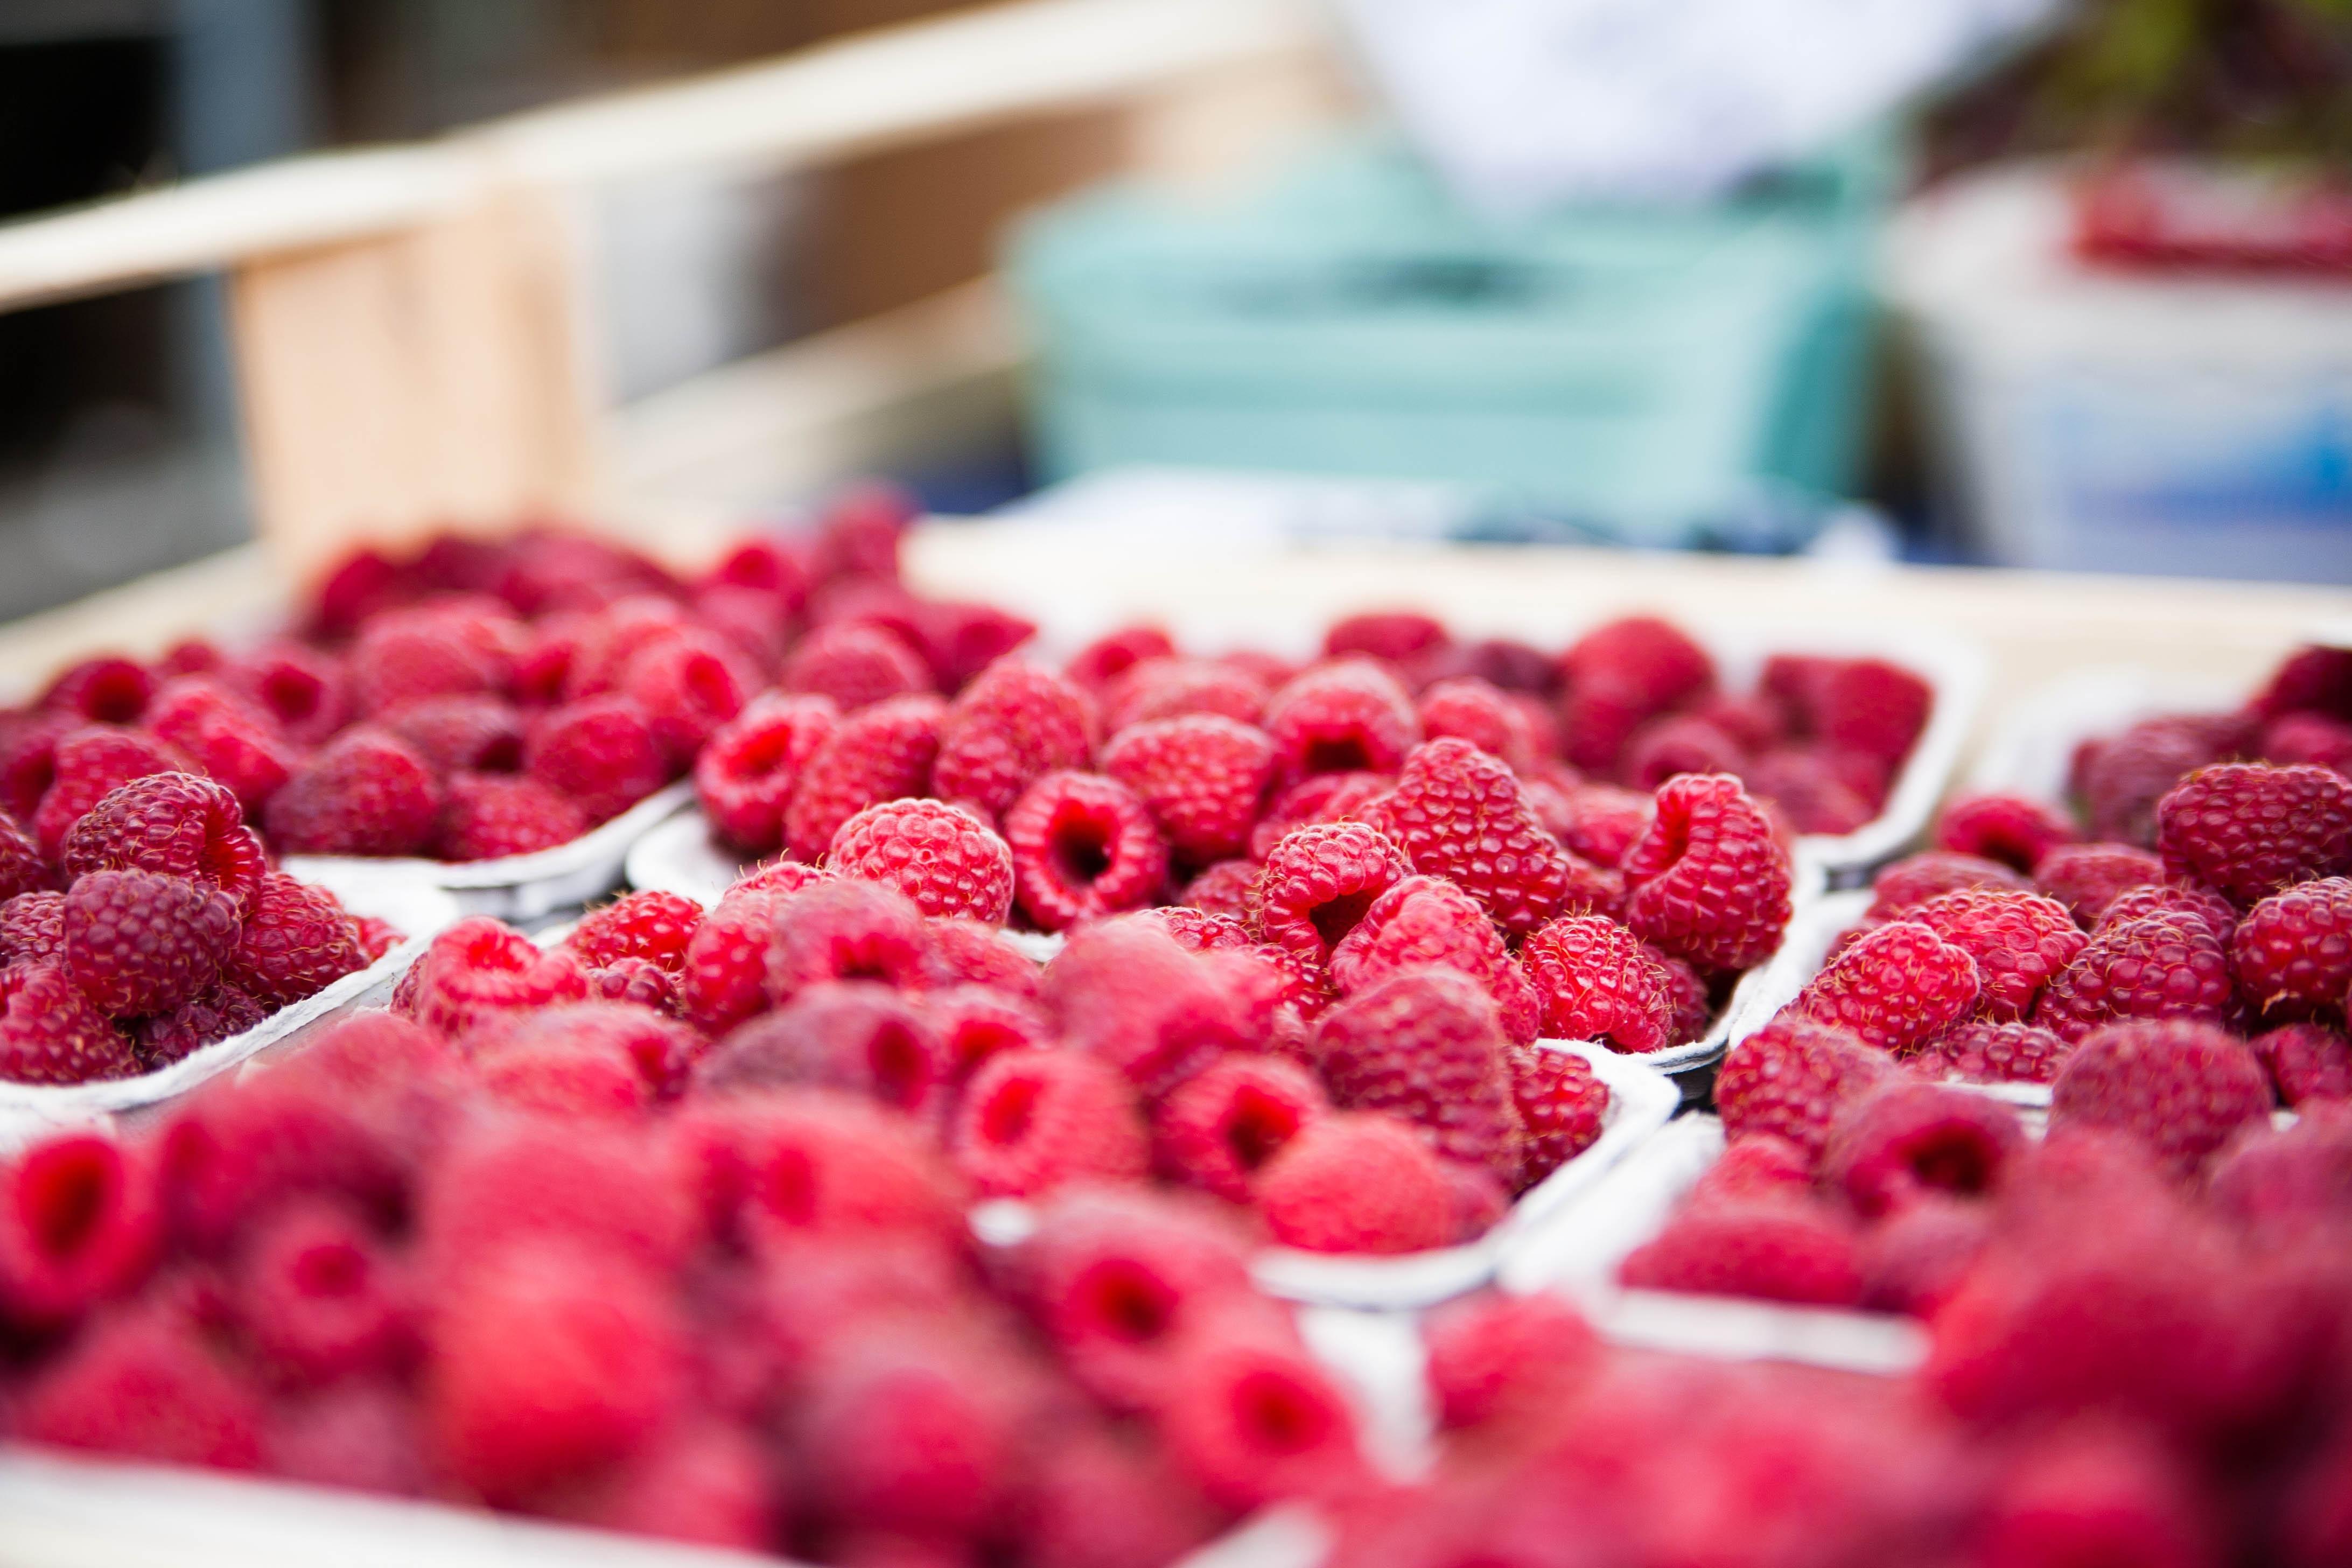 raspberries-422979